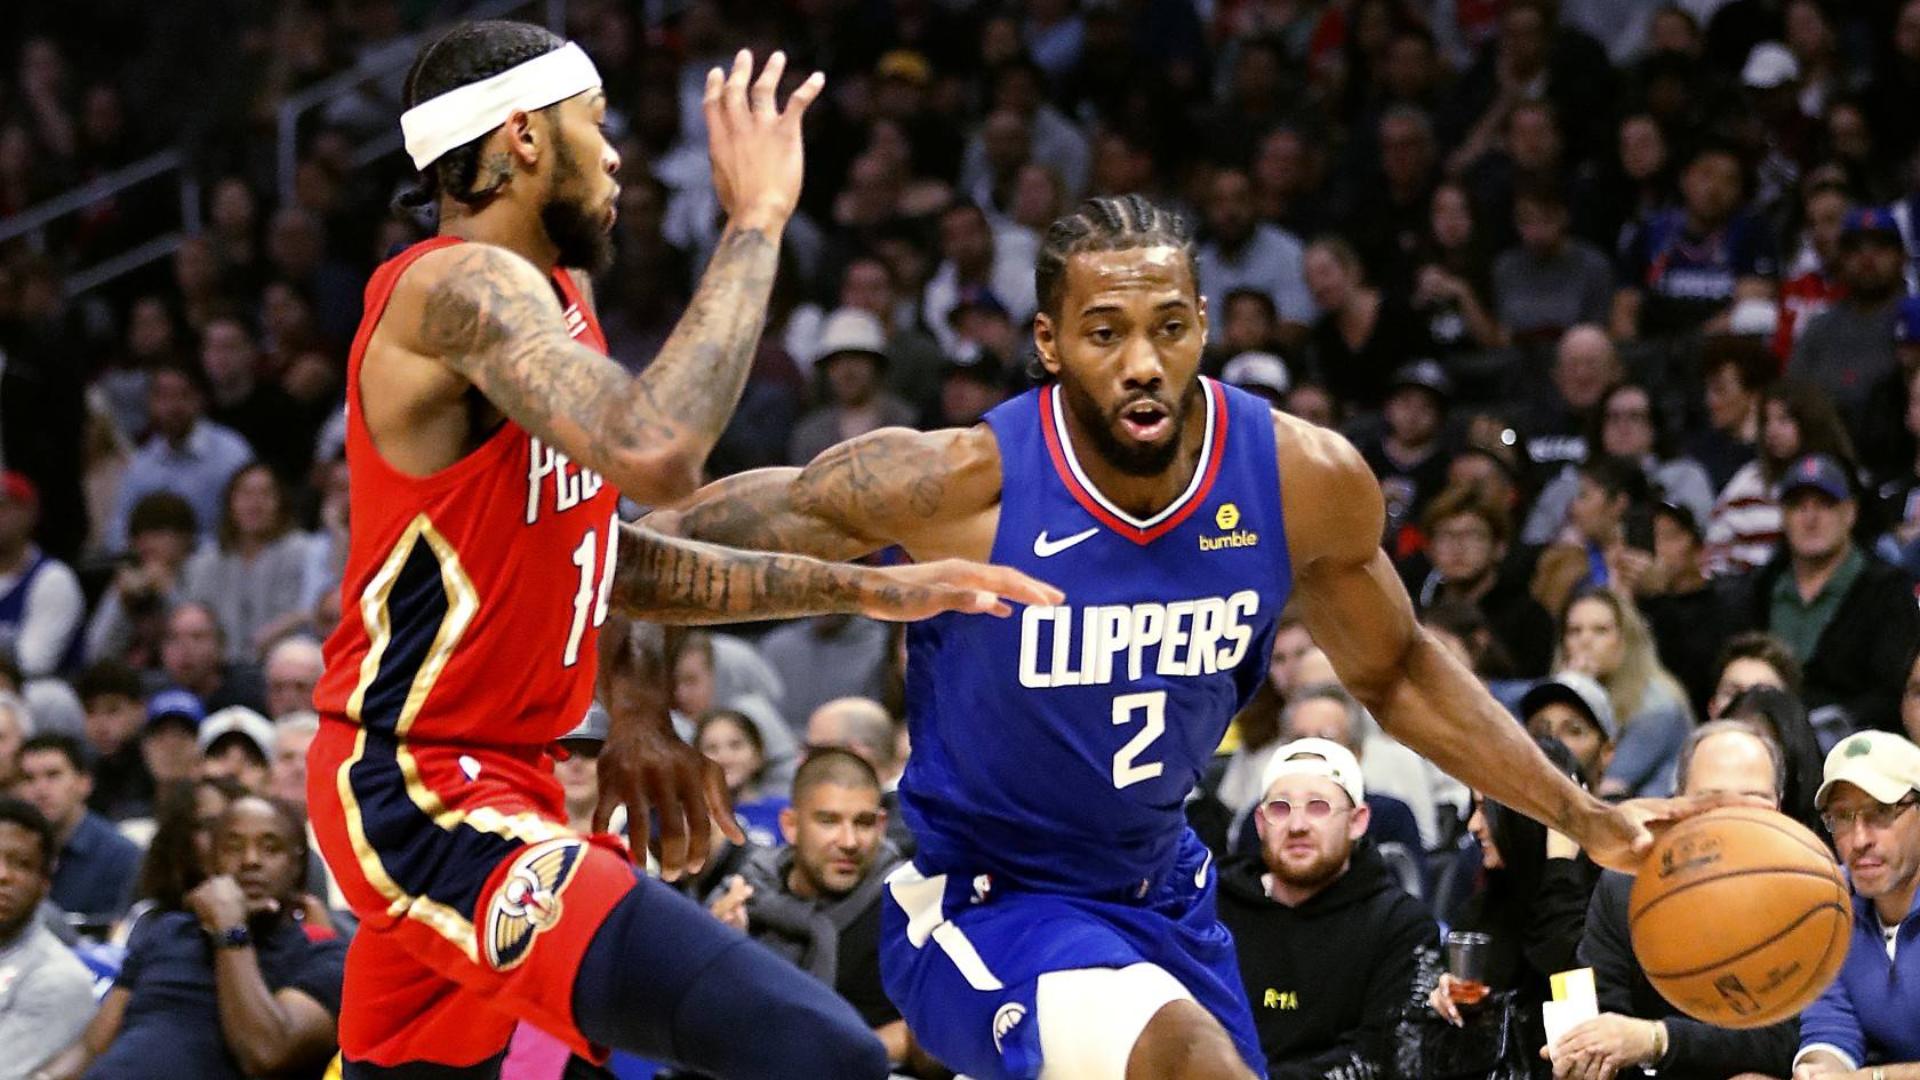 2019-2020 NBA常规赛 洛杉矶快船 VS 新奥尔良鹈鹕 集锦Part1